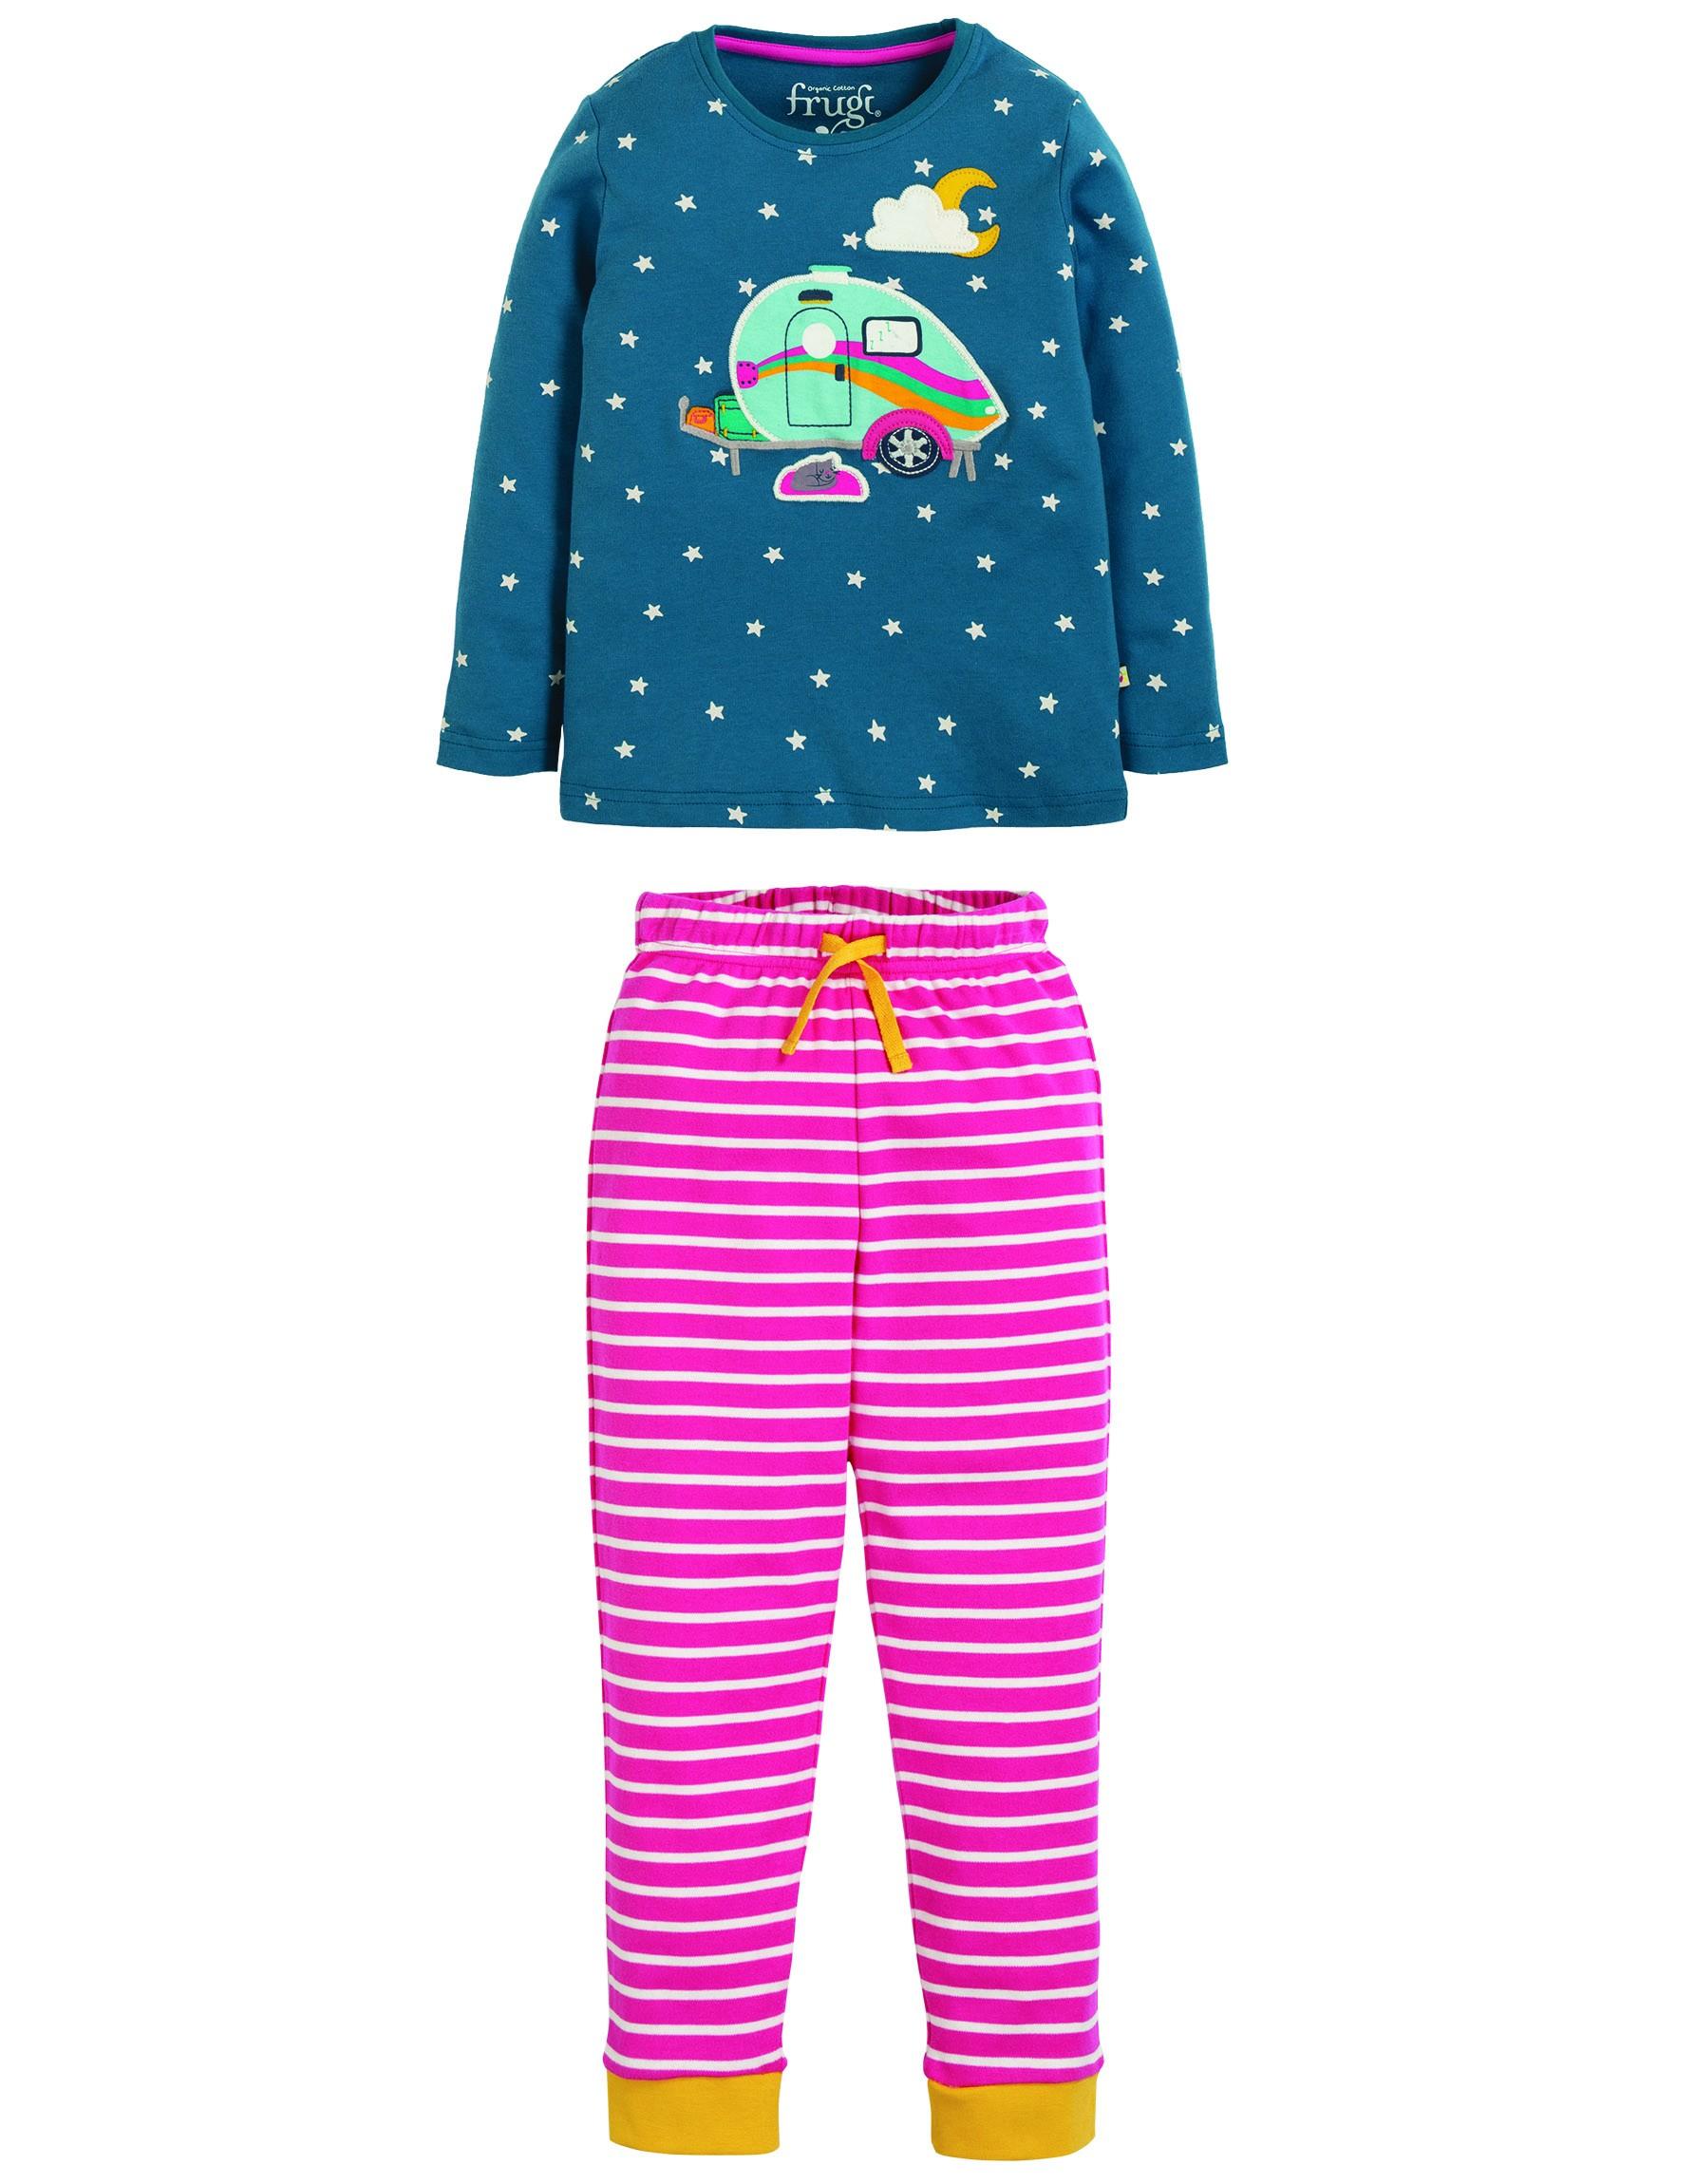 Pyjama Jake et les Pirates Where is Hook?   Pajamas, Boy